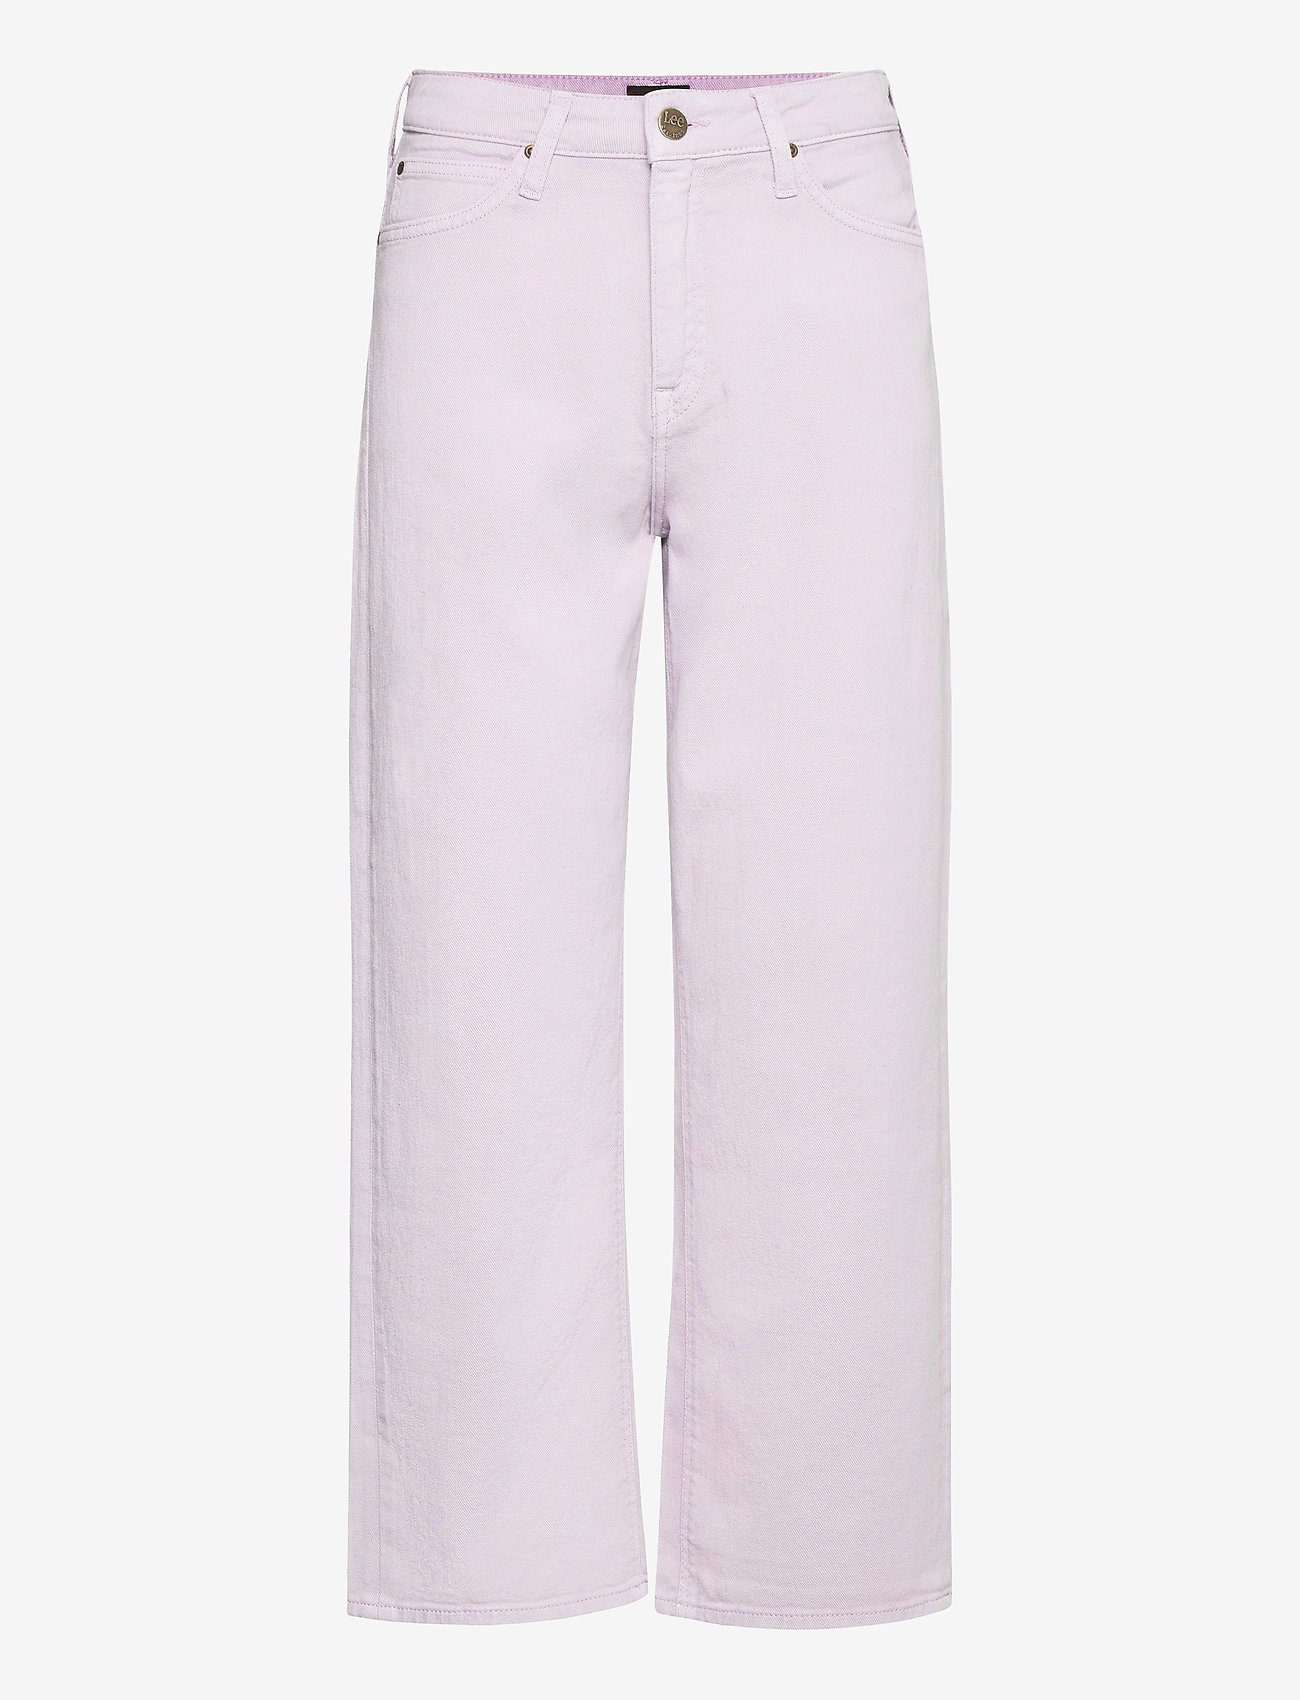 Lee Jeans - WIDE LEG - brede jeans - lilac - 0